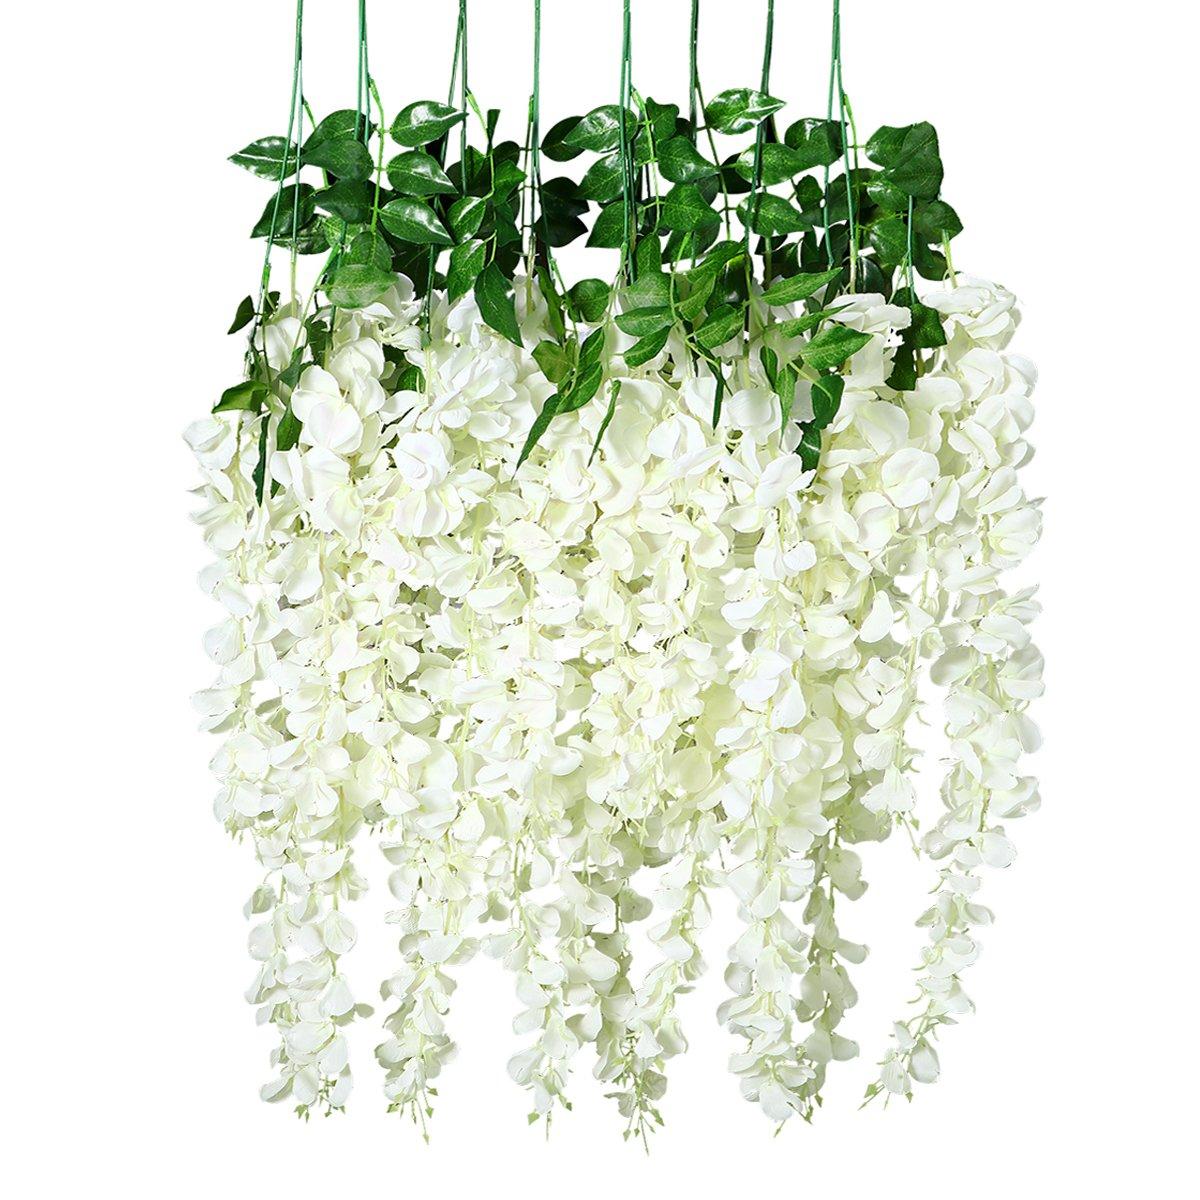 Unomor 3.25 Feet Wisteria Artificial Flowers Fake Hanging Flowers Vine Garland for Wedding Decorations (12 Pcs)